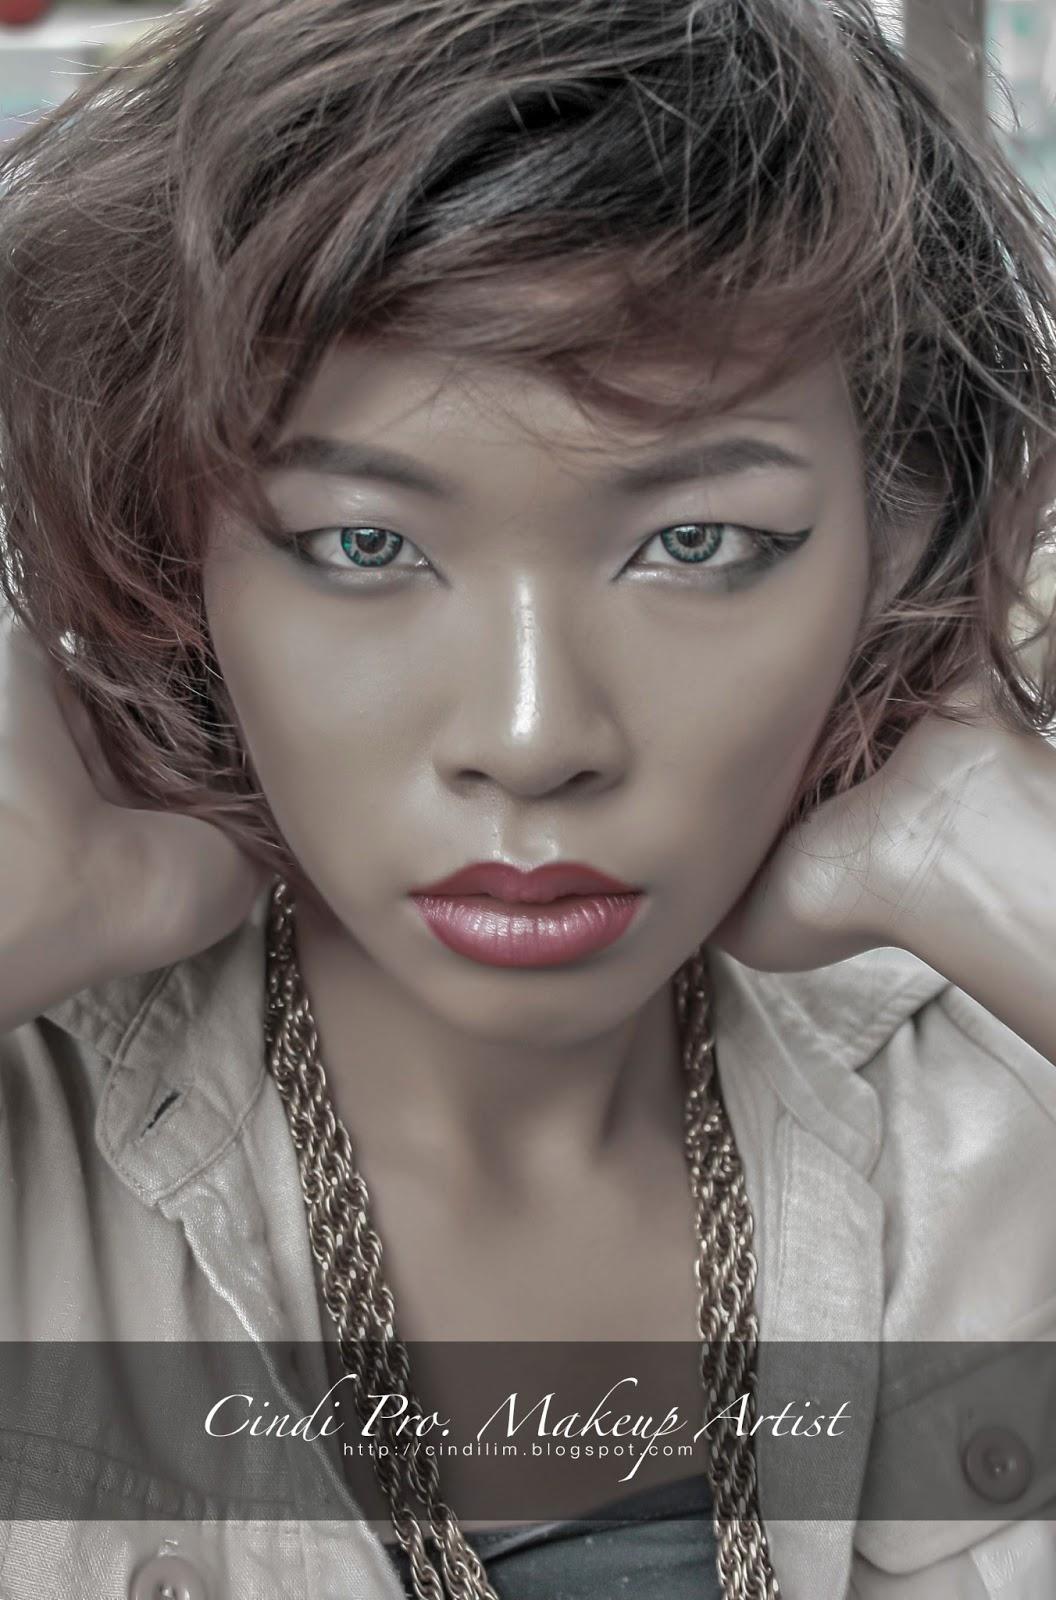 Cindi Pro Makeup Artist Commercial Photoshoot Makeup: :: Cindi Pro. Makeup Artist ::: Repost : Fashion Shoot